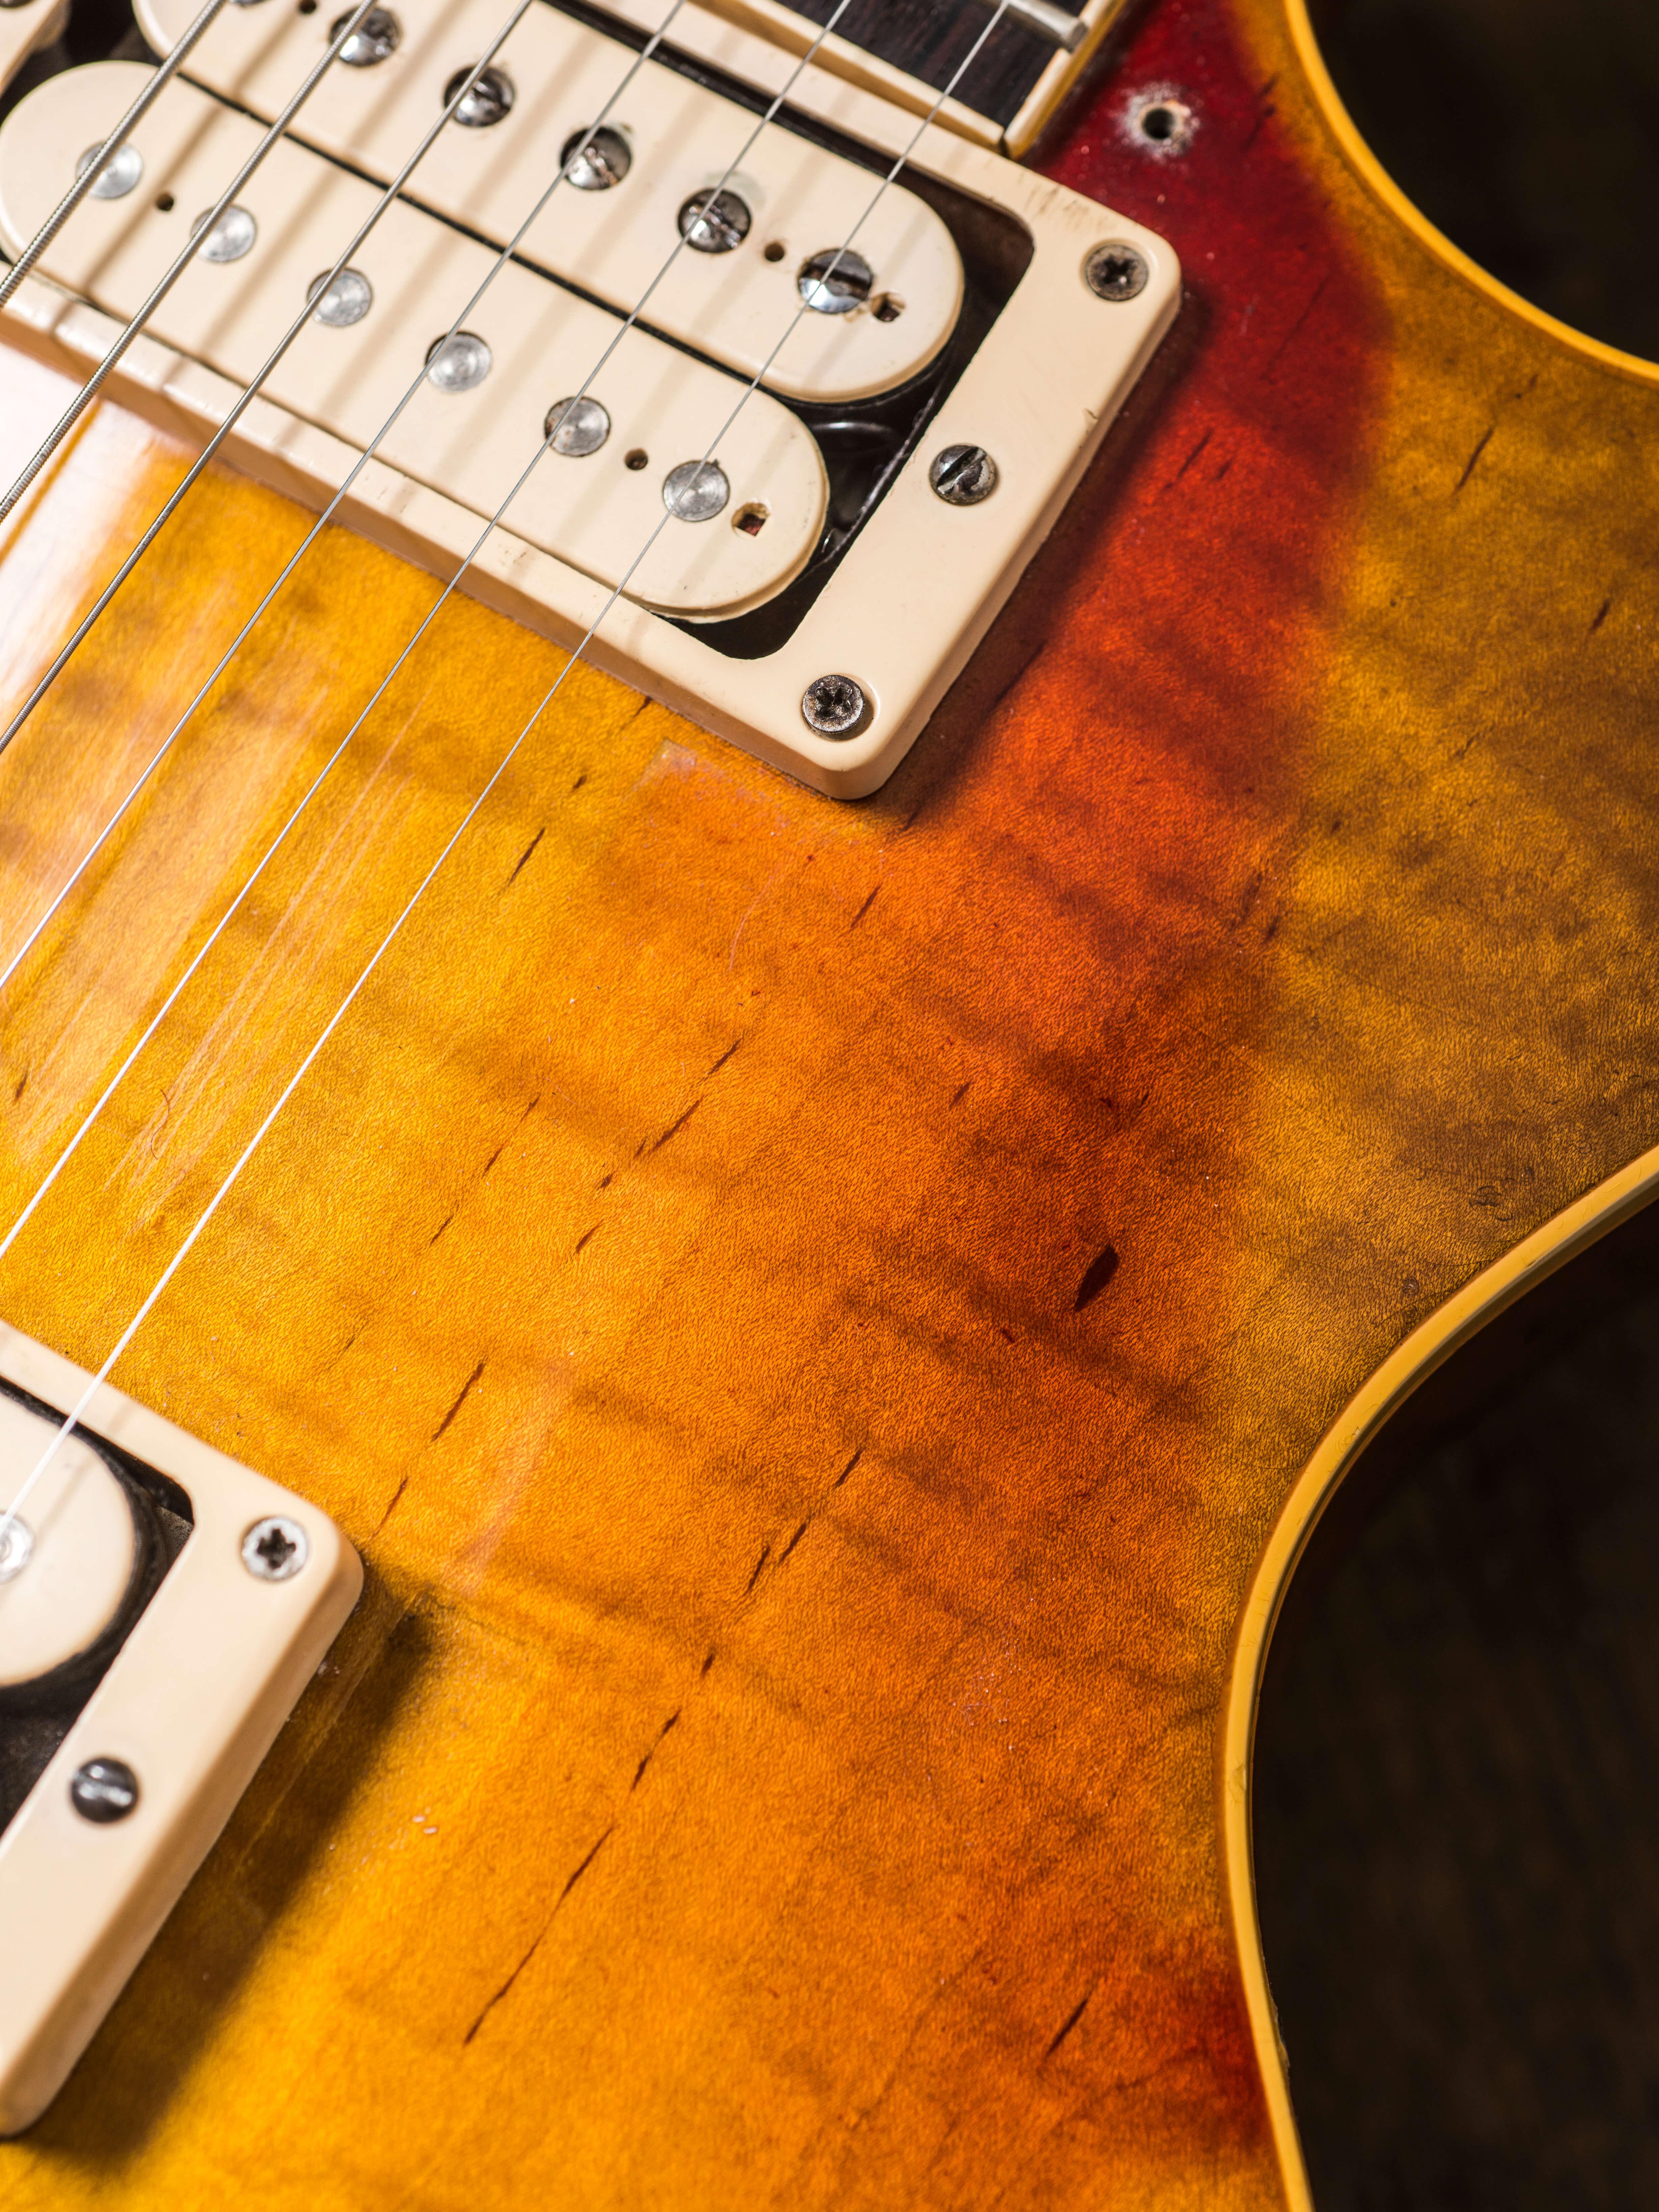 Gary Richrath 1959 Gibson Les Paul burst details